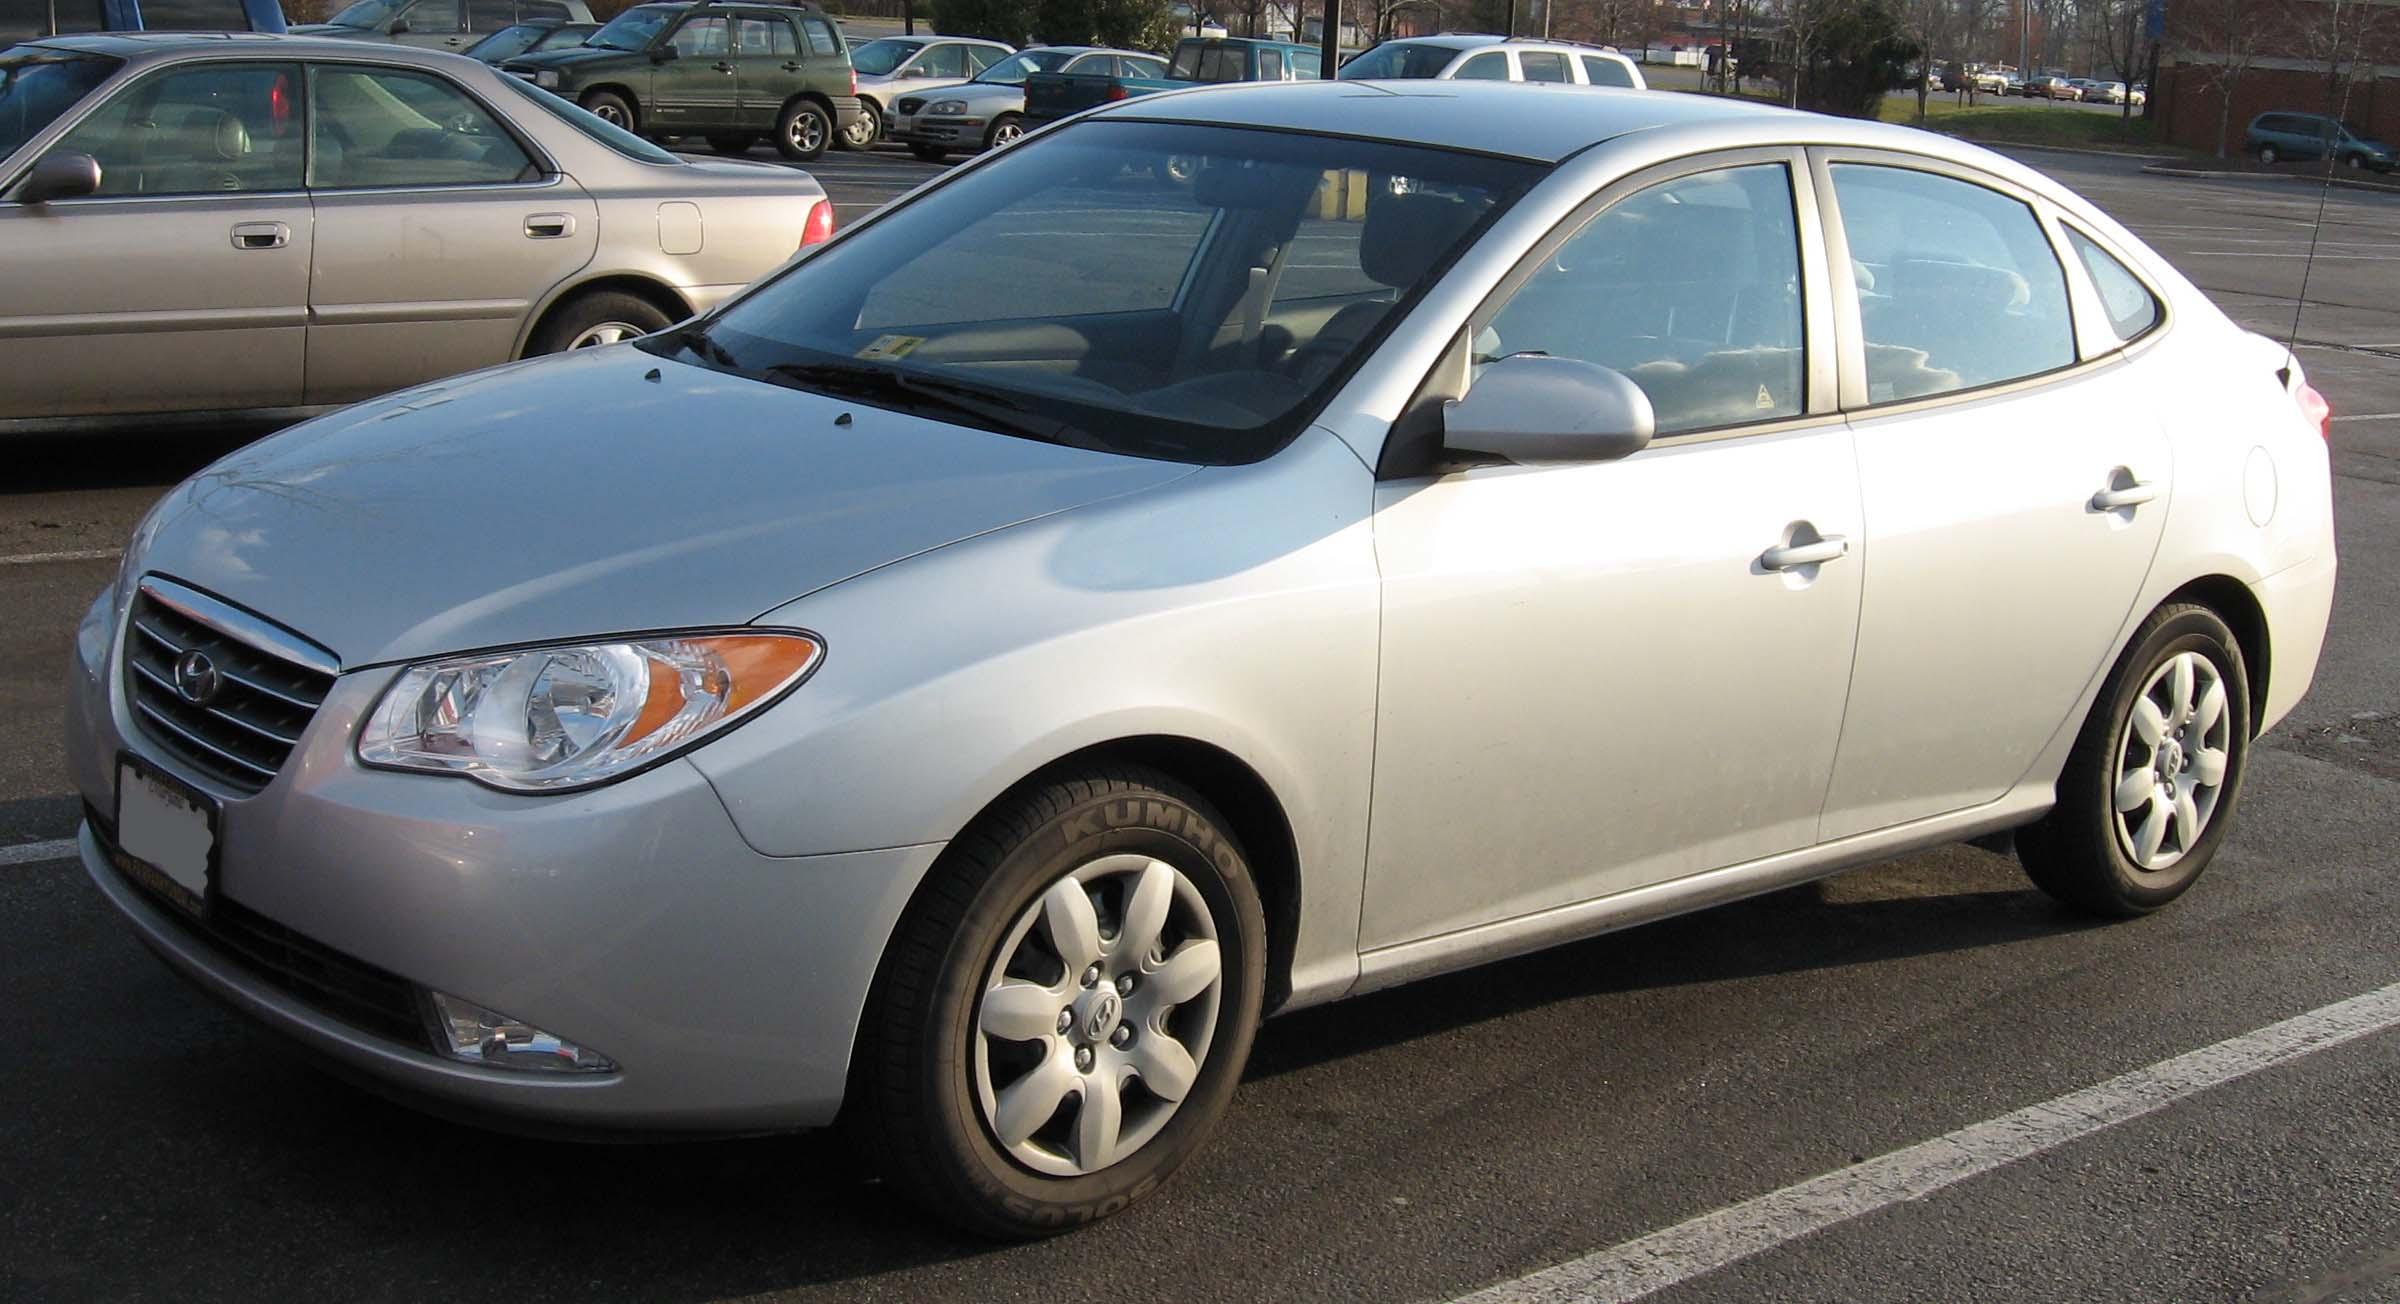 File:2007-Hyundai-Elantra.jpg - Wikimedia Commons